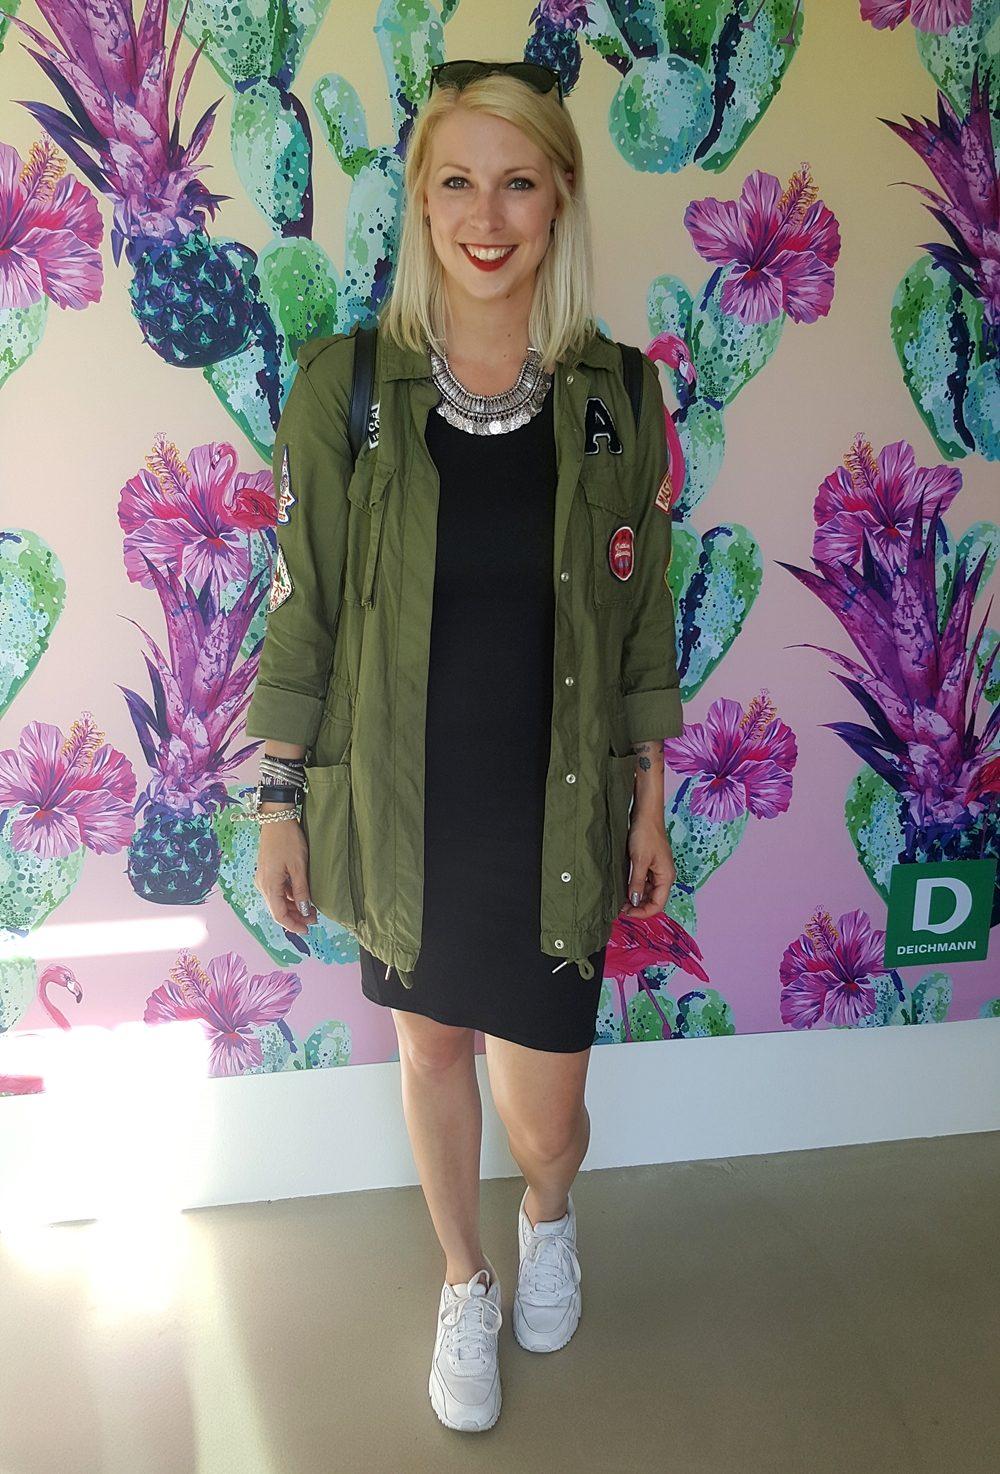 Deichmann Blogger Loft Mercedes Benz Fashion Week Berlin Juli 2016 (6)